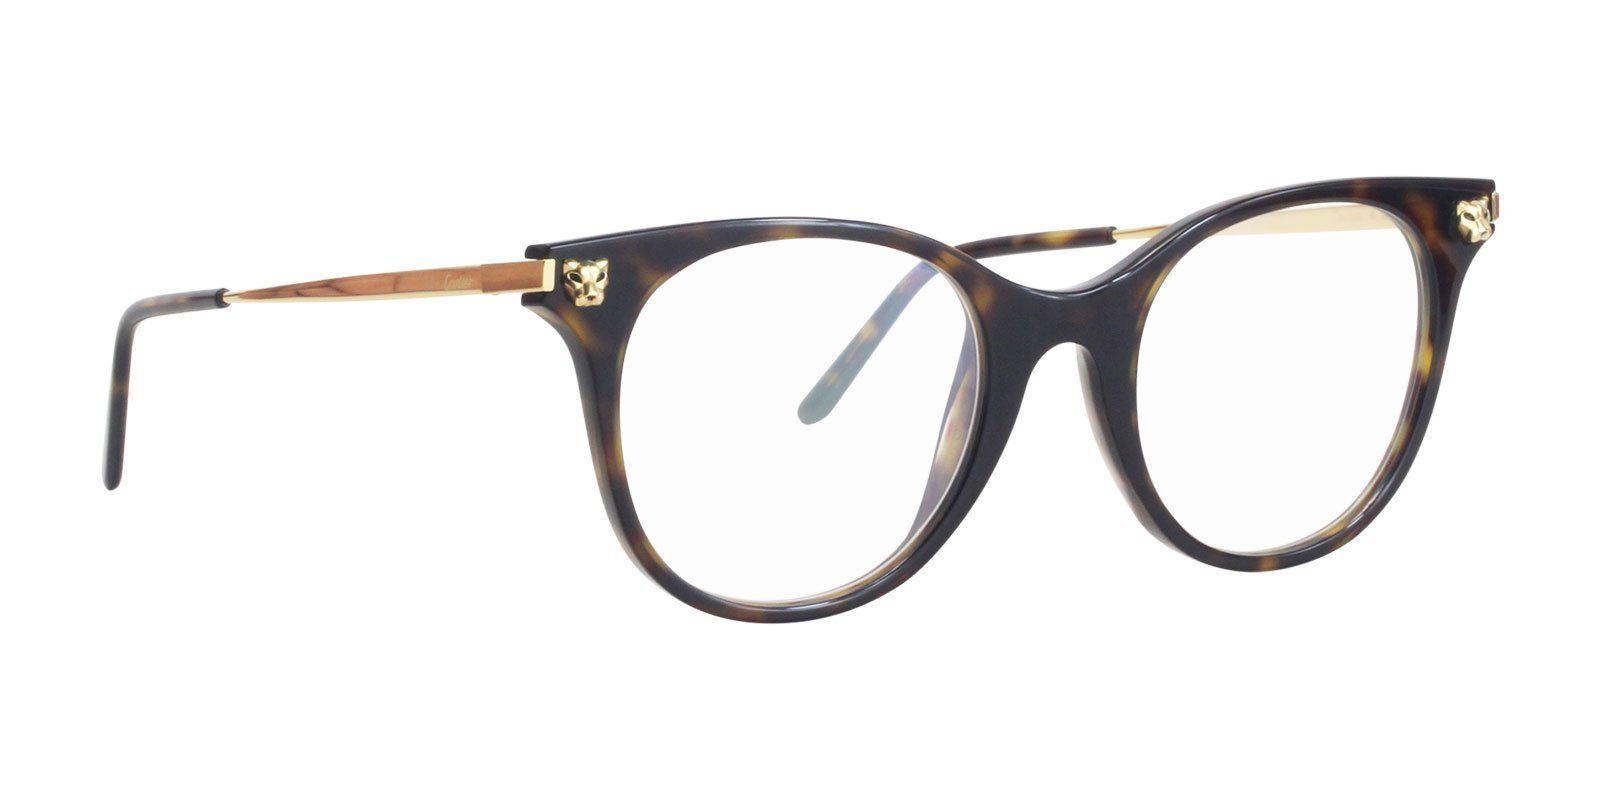 8d3cd2242bfb Cartier - Panthère de Cartier CT0031O - 002 eyeglasses